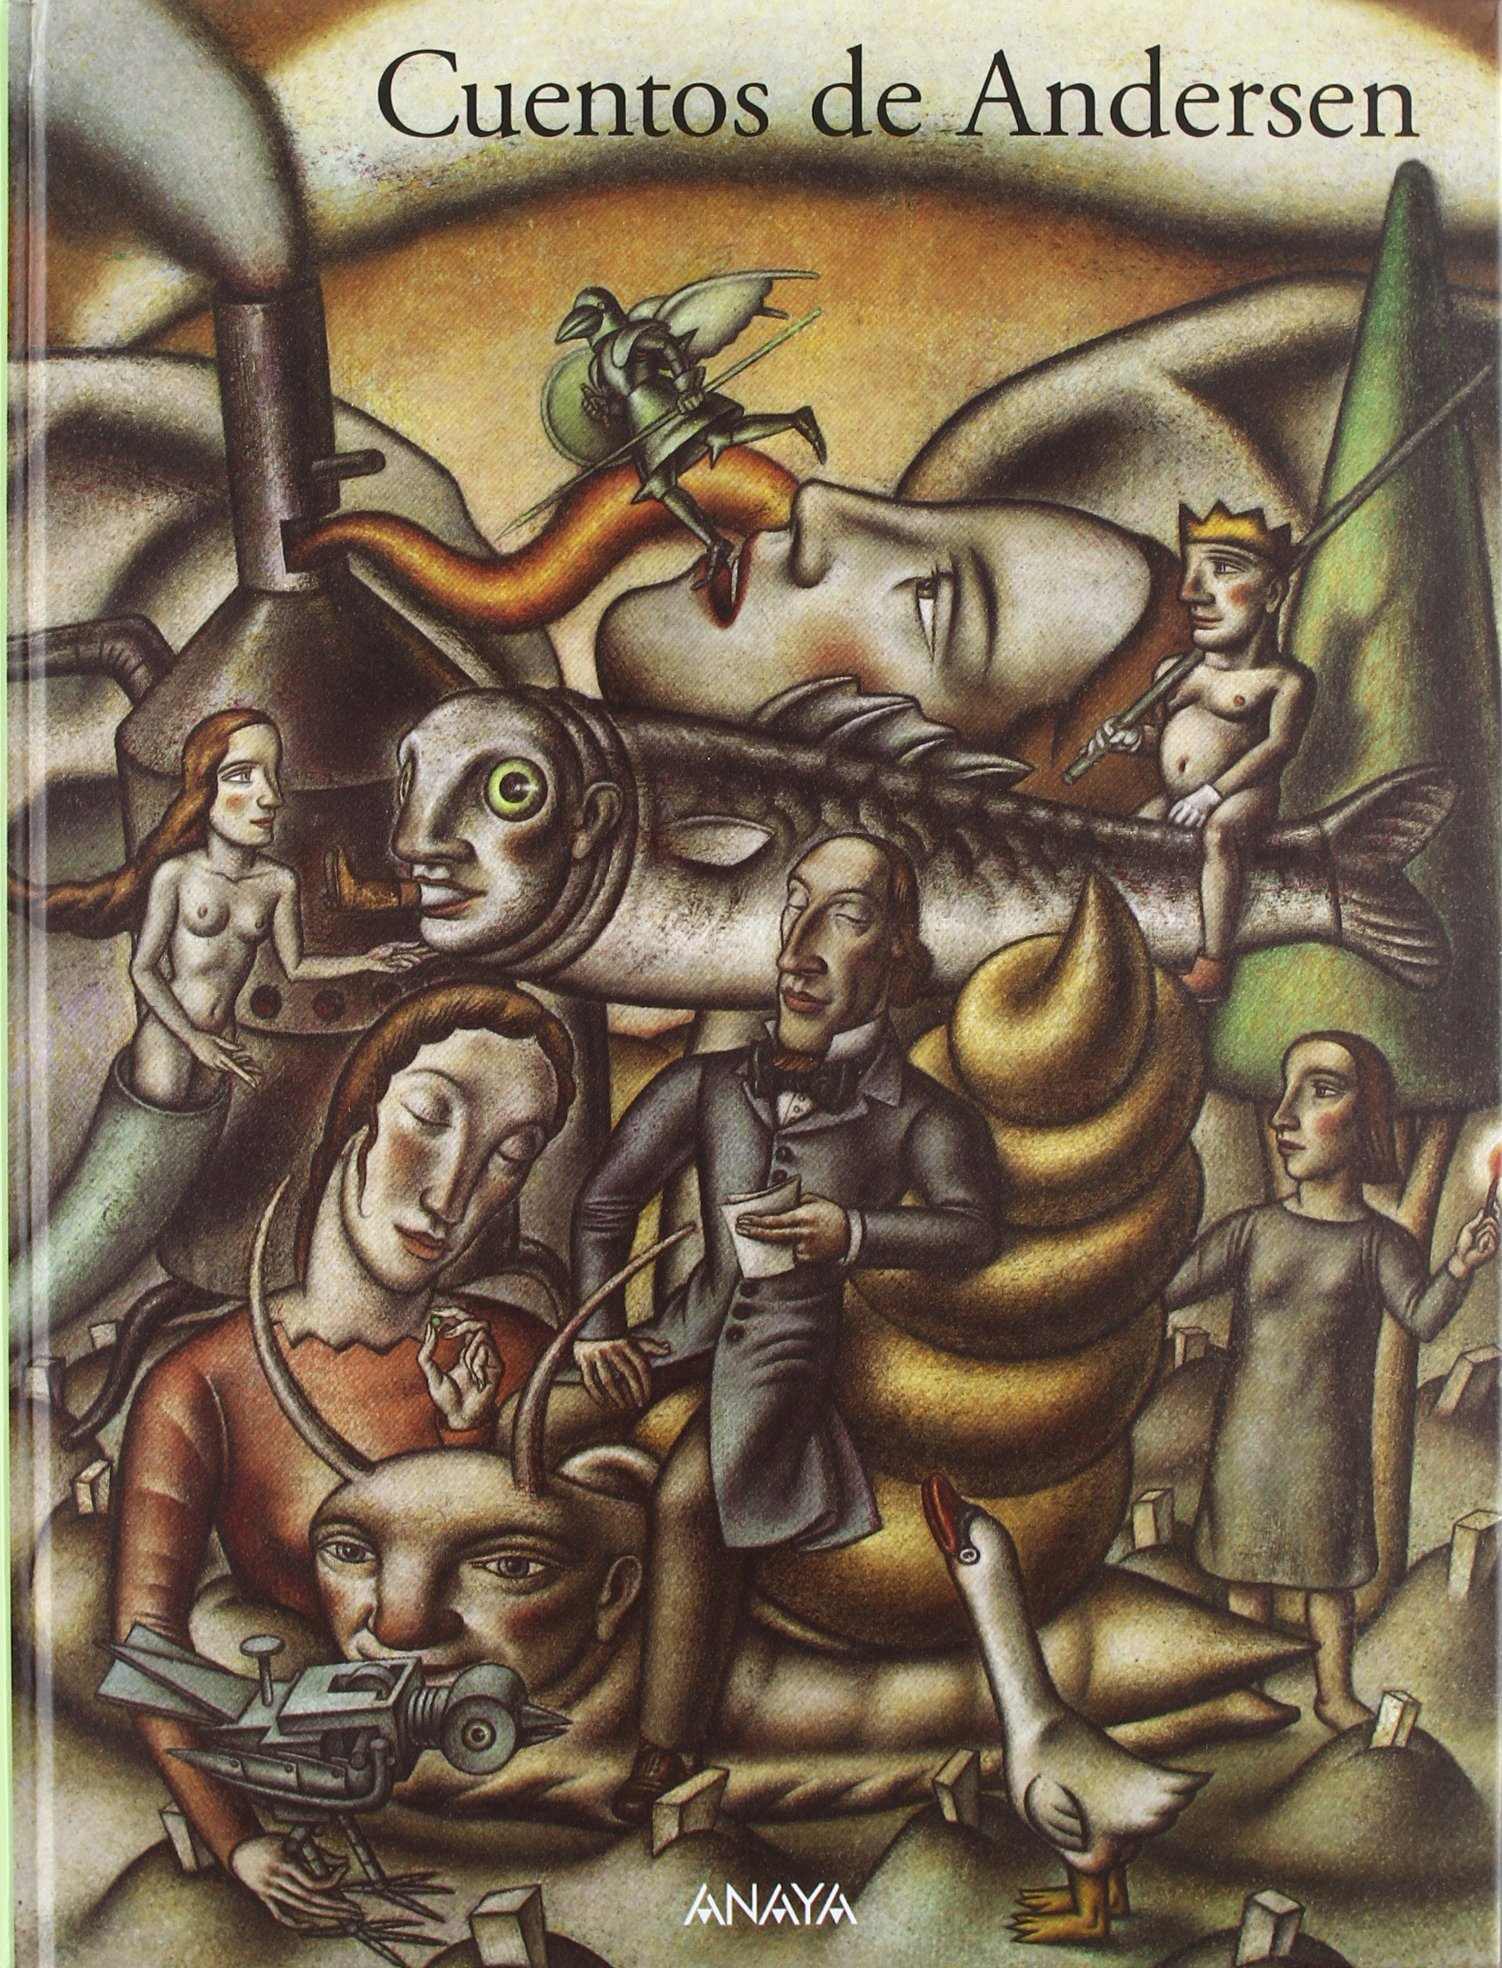 Cuentos de Andersen/ Tales of Andersen (Spanish Edition): Hans Christian Andersen, Javier Serrano, Gustavo Martin Garzo: 9788420792651: Amazon.com: Books